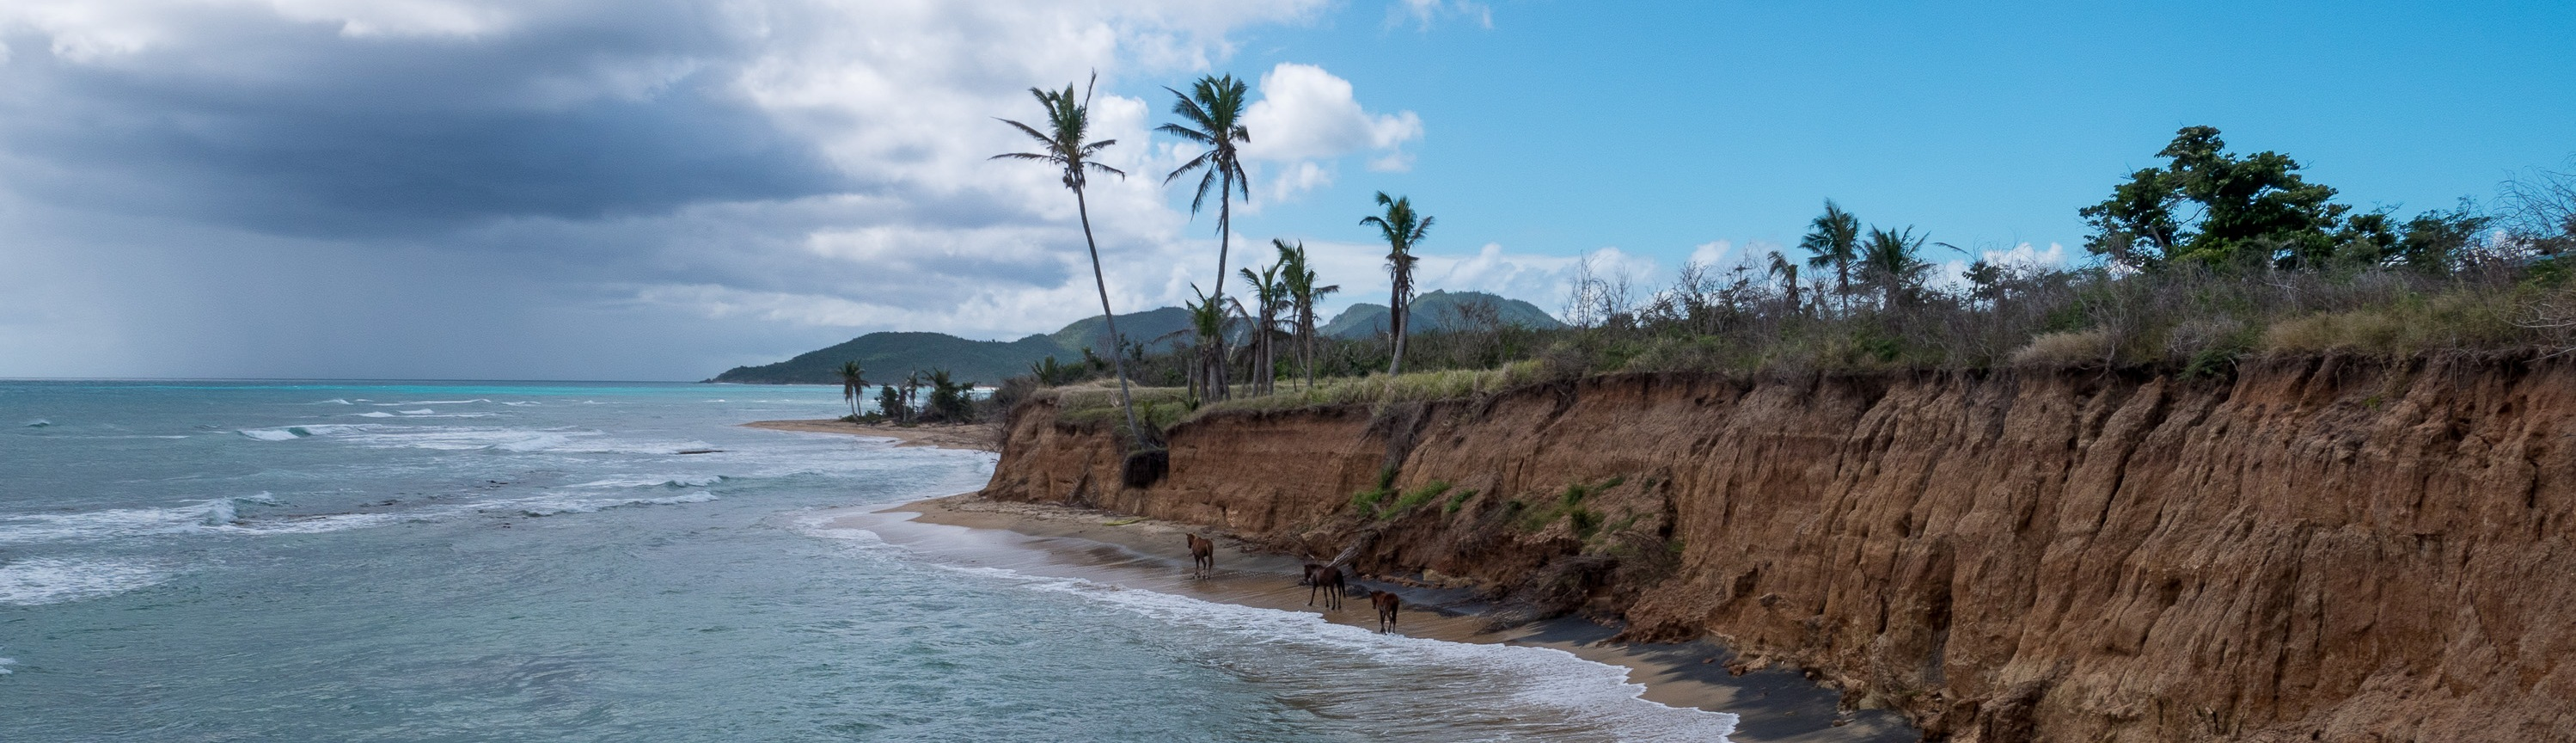 Vieques (5 of 1) — kopia